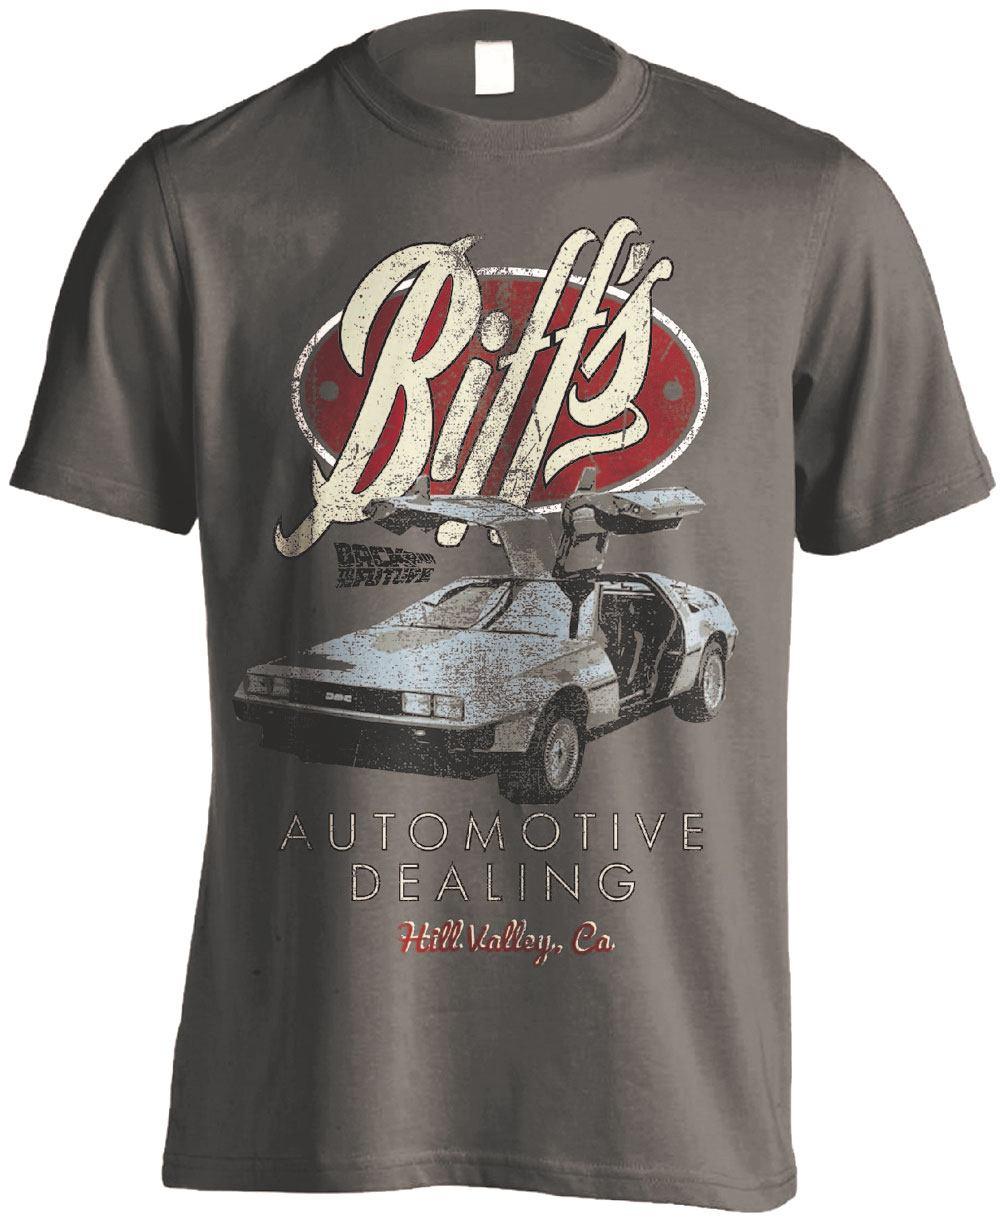 Back to the Future T-Shirt Biffs Automotive Size L